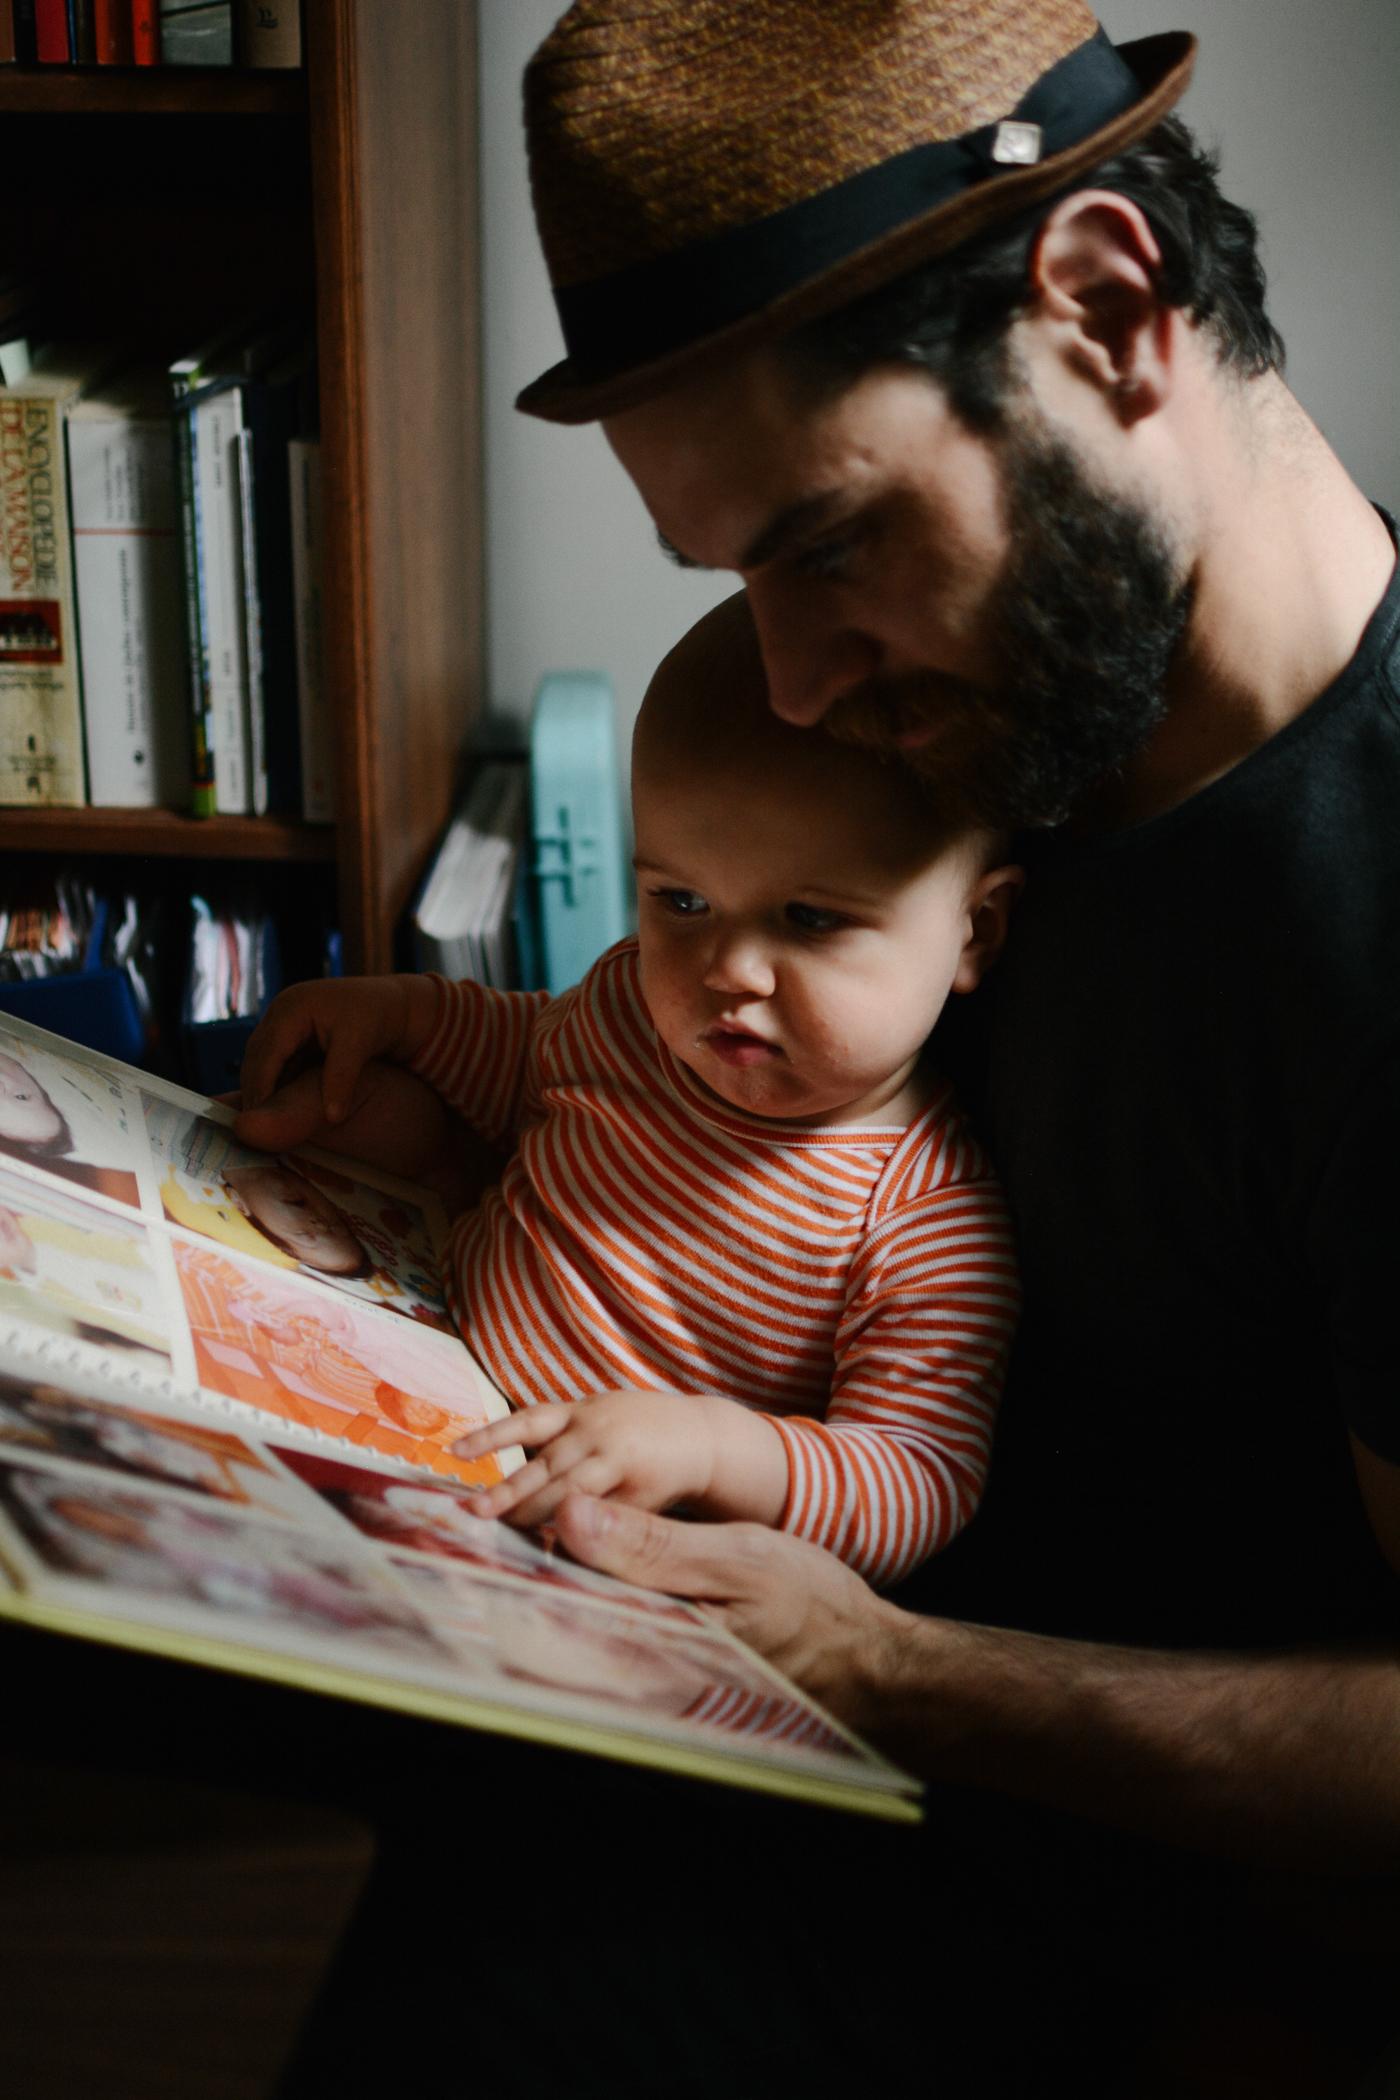 Bebe_toute_annee_Marianne_Charland_photographe_famille_nouveau-ne_enfant_Montreal_Basse-37.jpg